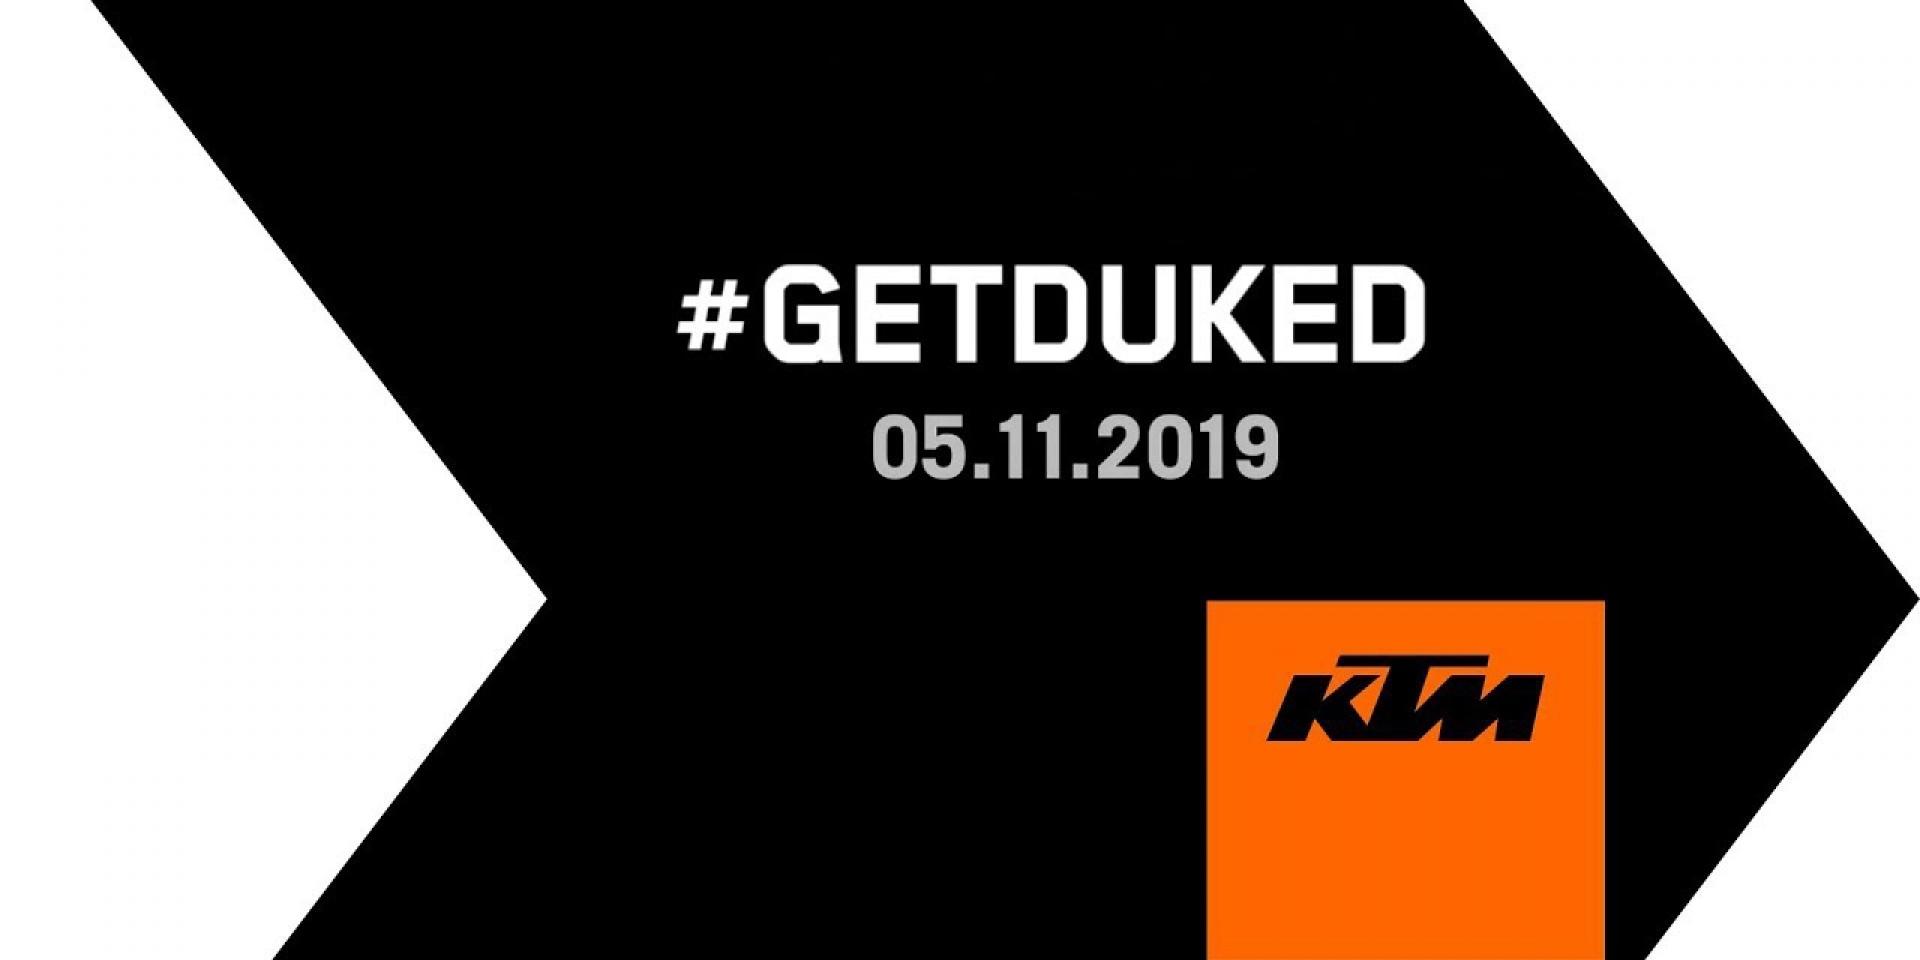 2020 KTM 1290 Super Duke R米蘭改款發表?!KTM最新預告片詳細分析